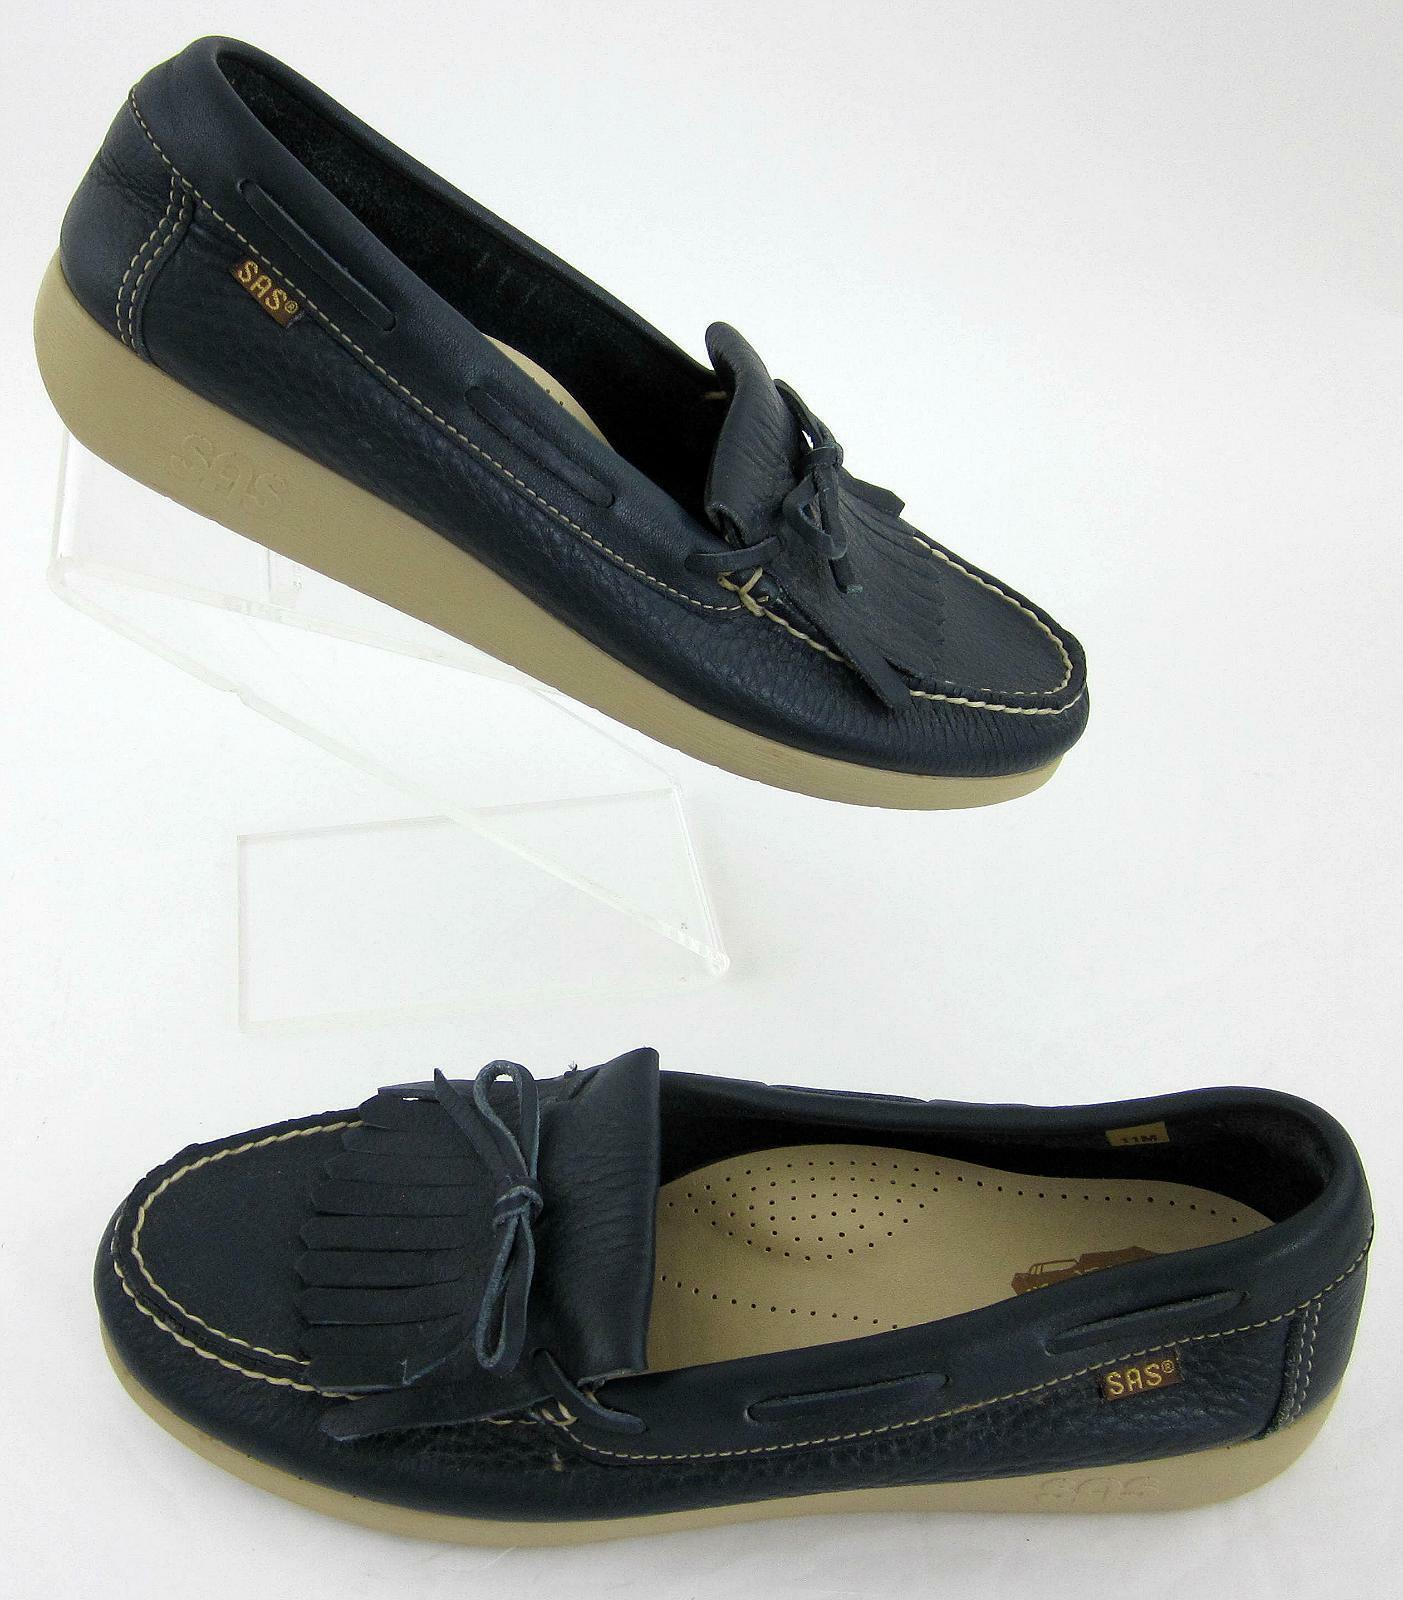 New! SAS Womens 'Kiltie 40' Slip On Shoes Navy Blue Sz 11M